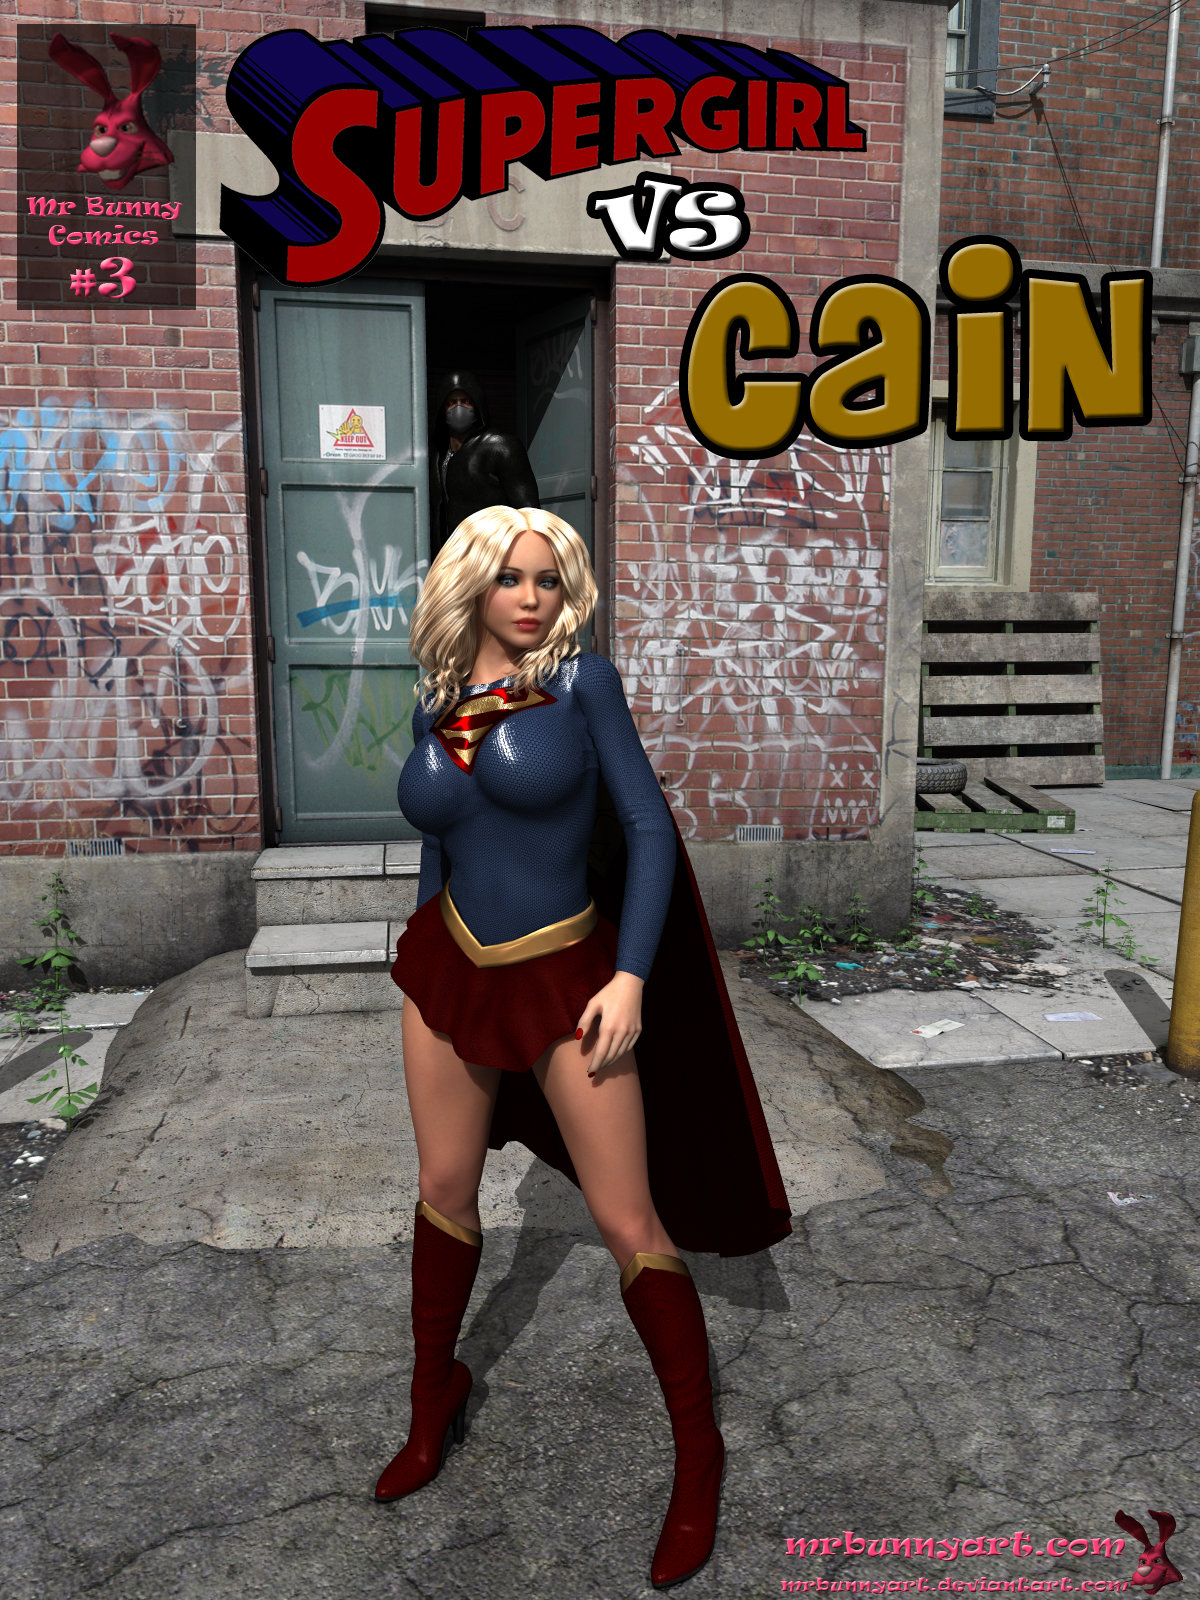 SureFap xxx porno Superman - [MrBunnyArt] - Supergirl Vs Cain